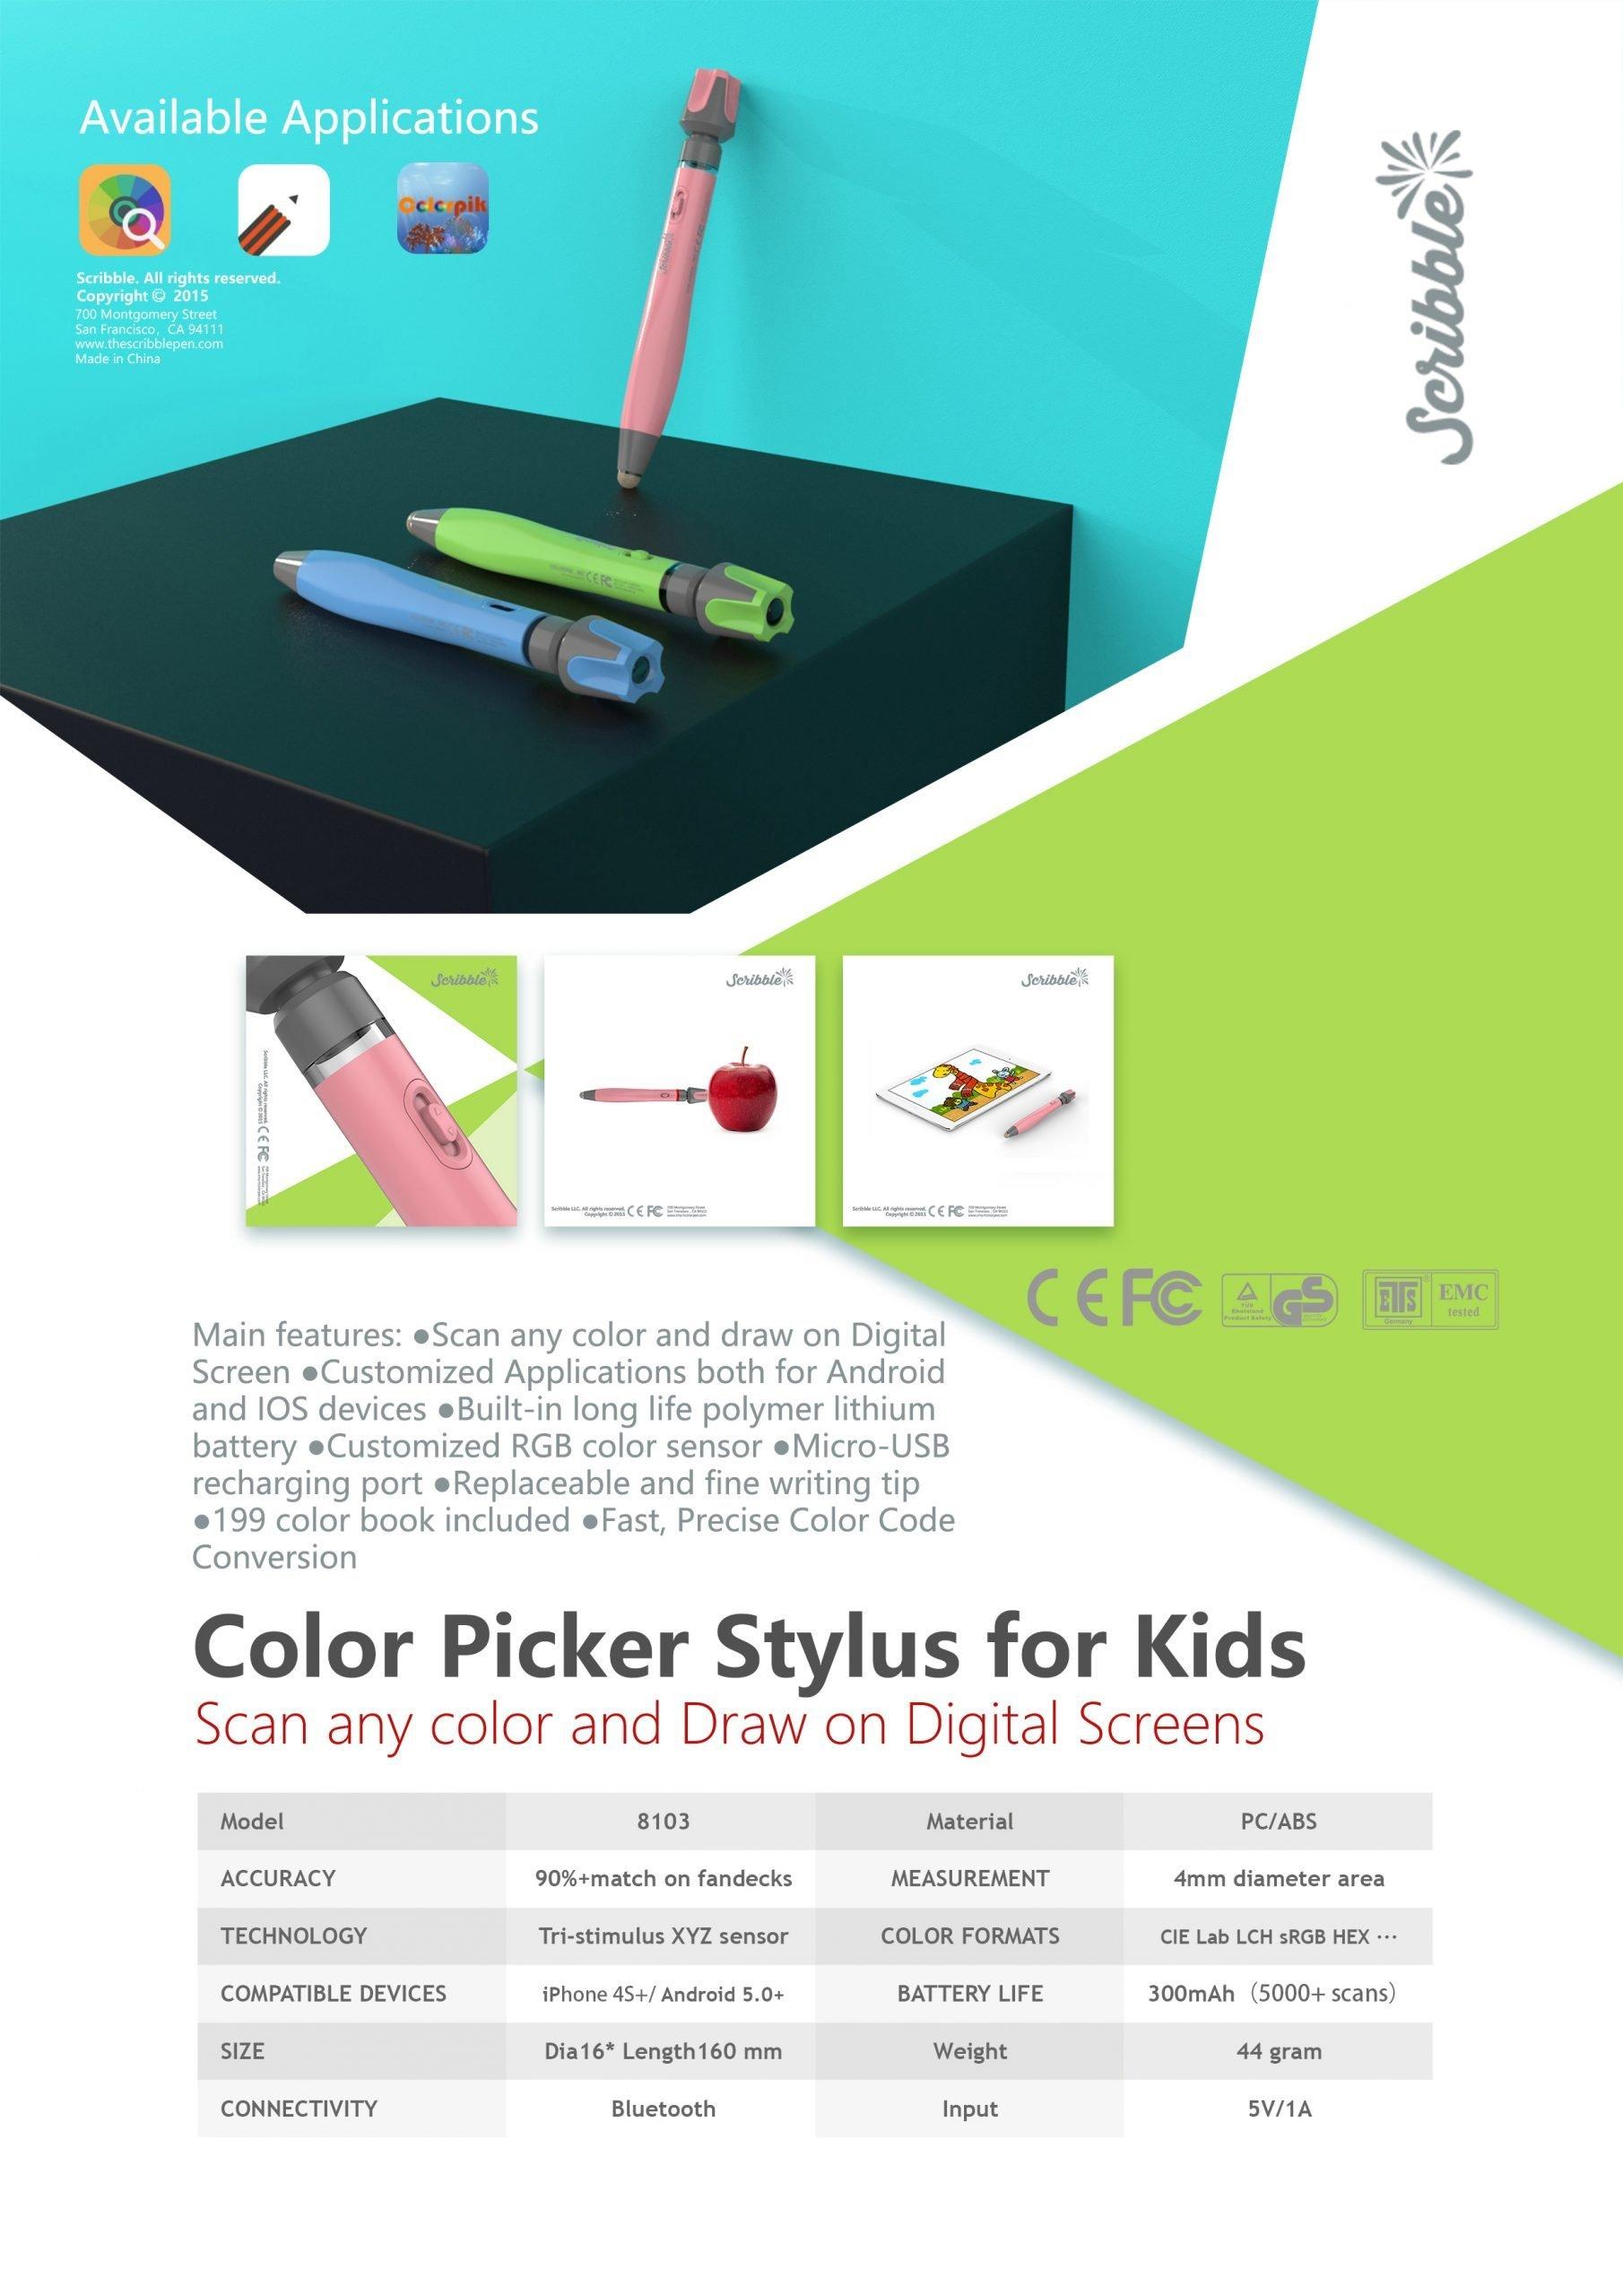 Color Picker Stylus for Kids